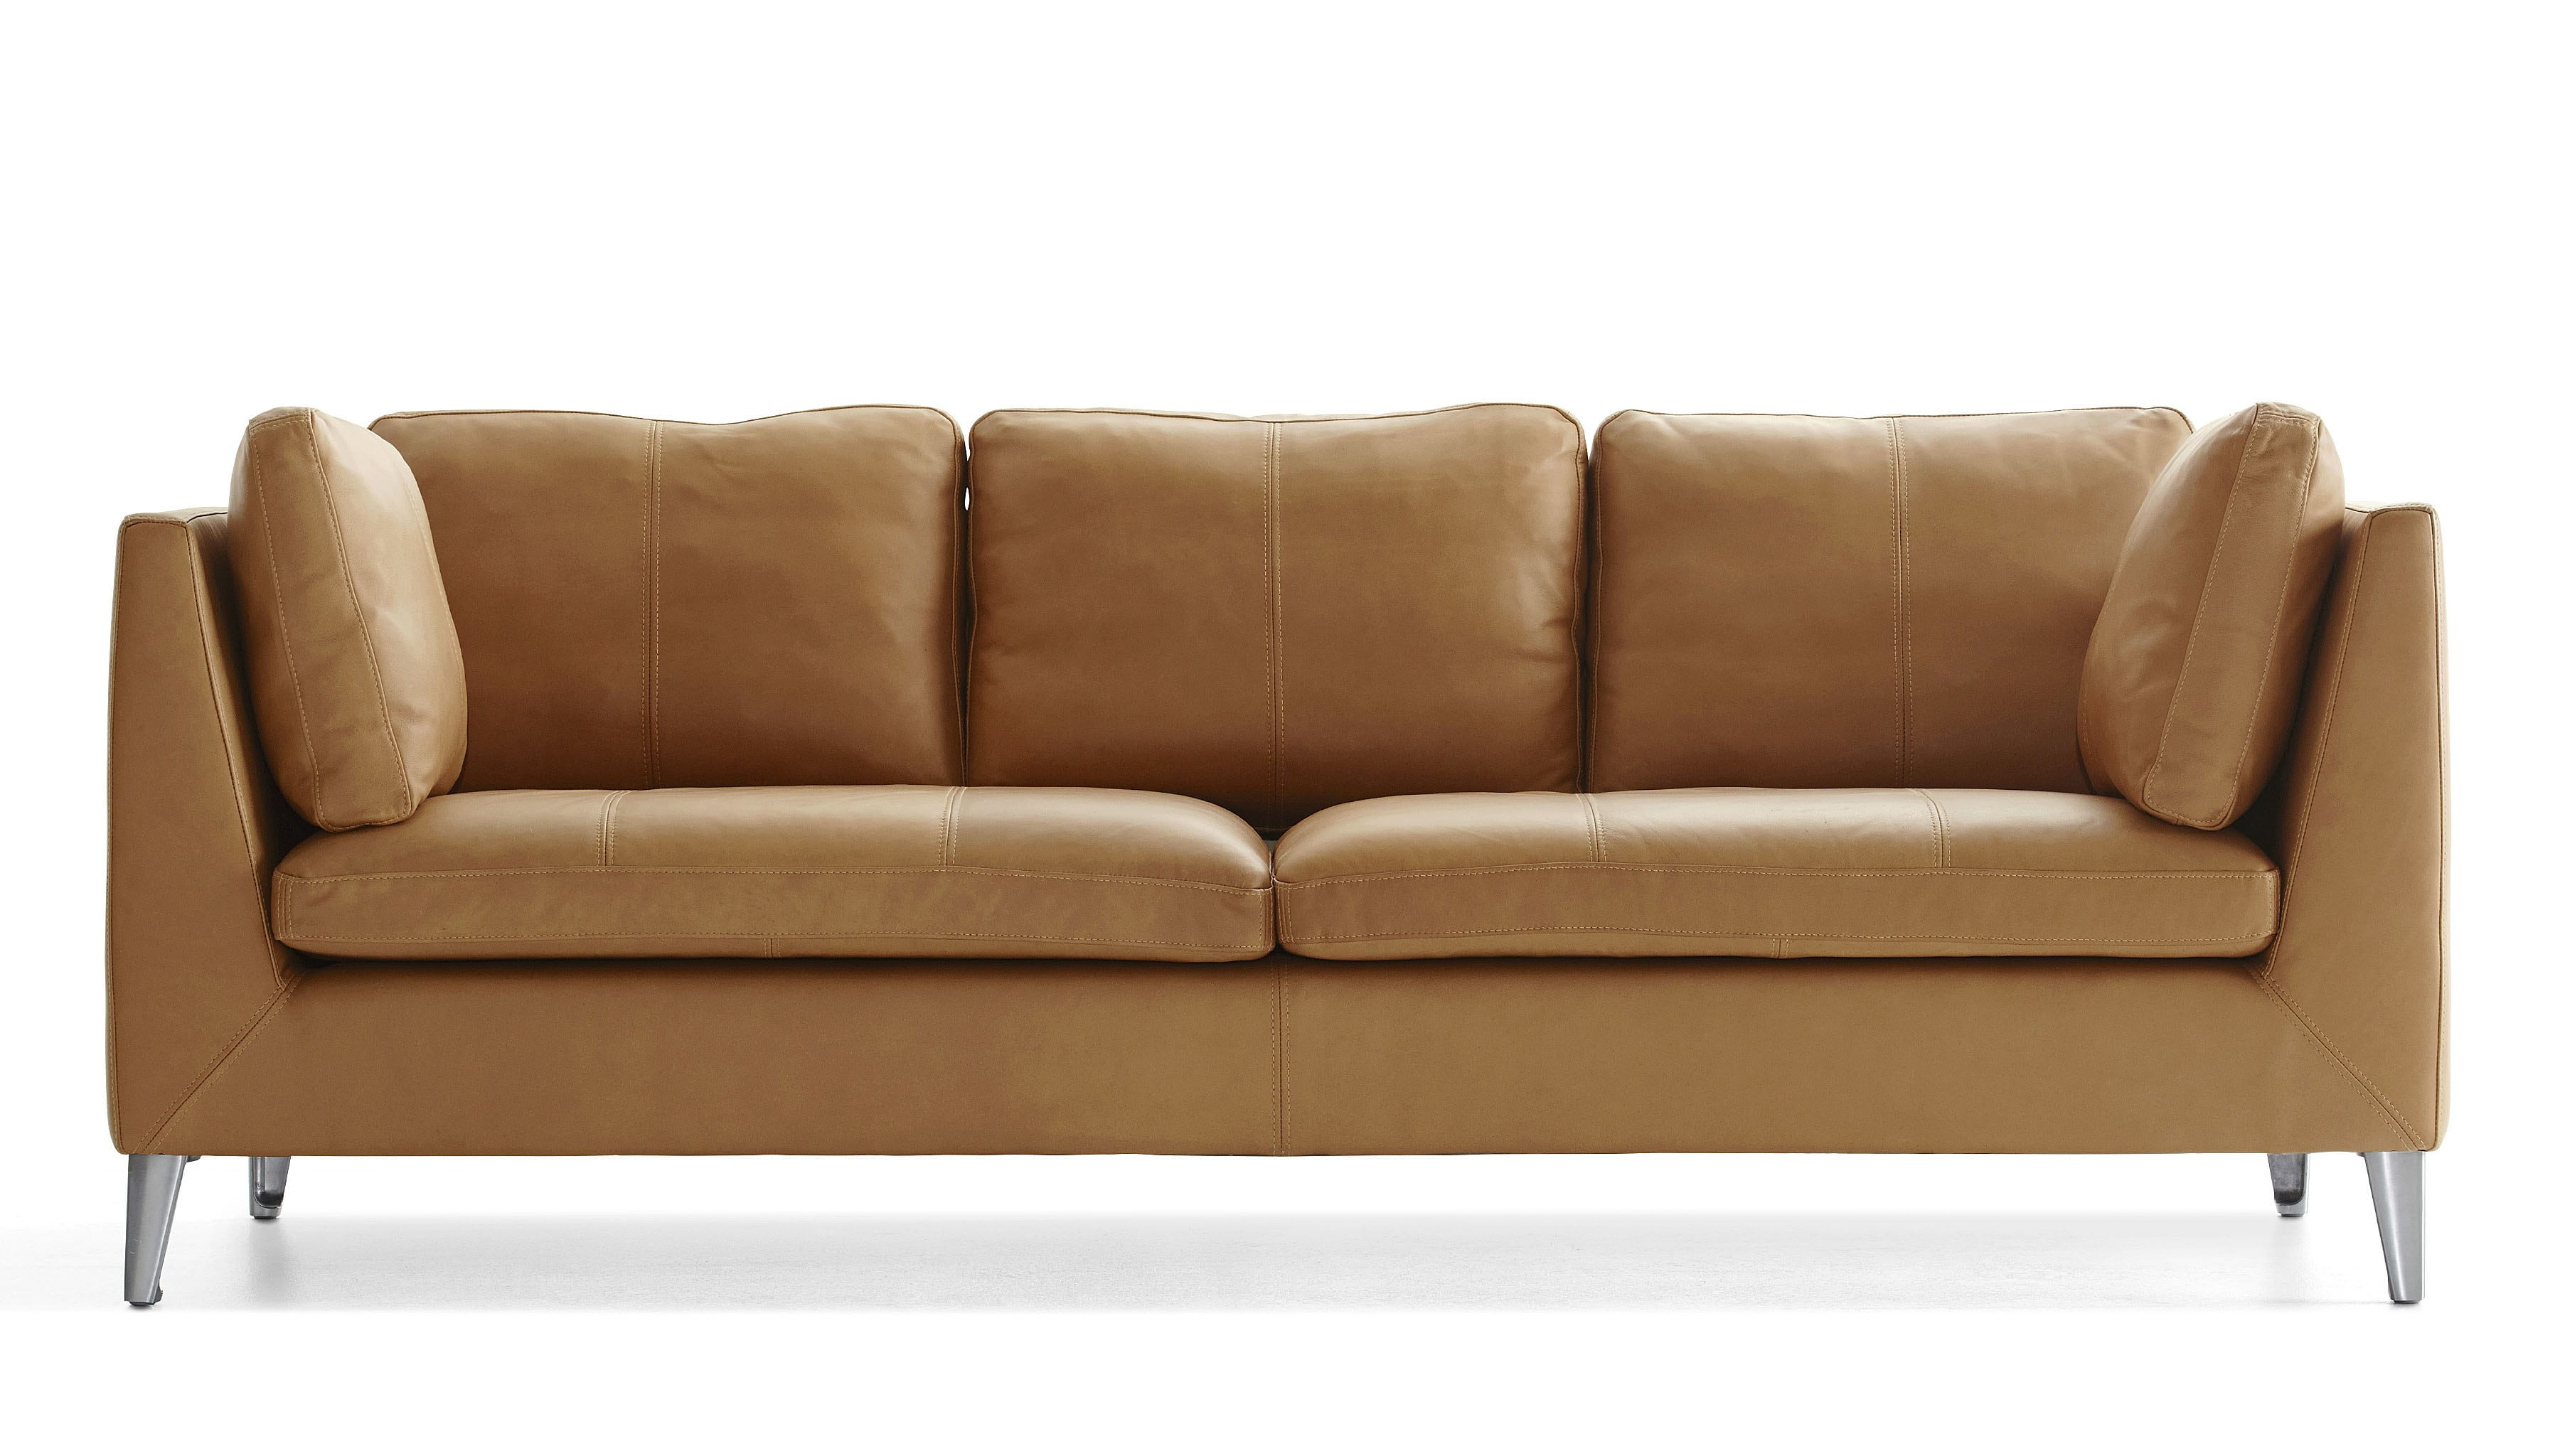 Sofas Baratos Zaragoza Ipdd sofà S Y Sillones Pra Online Ikea